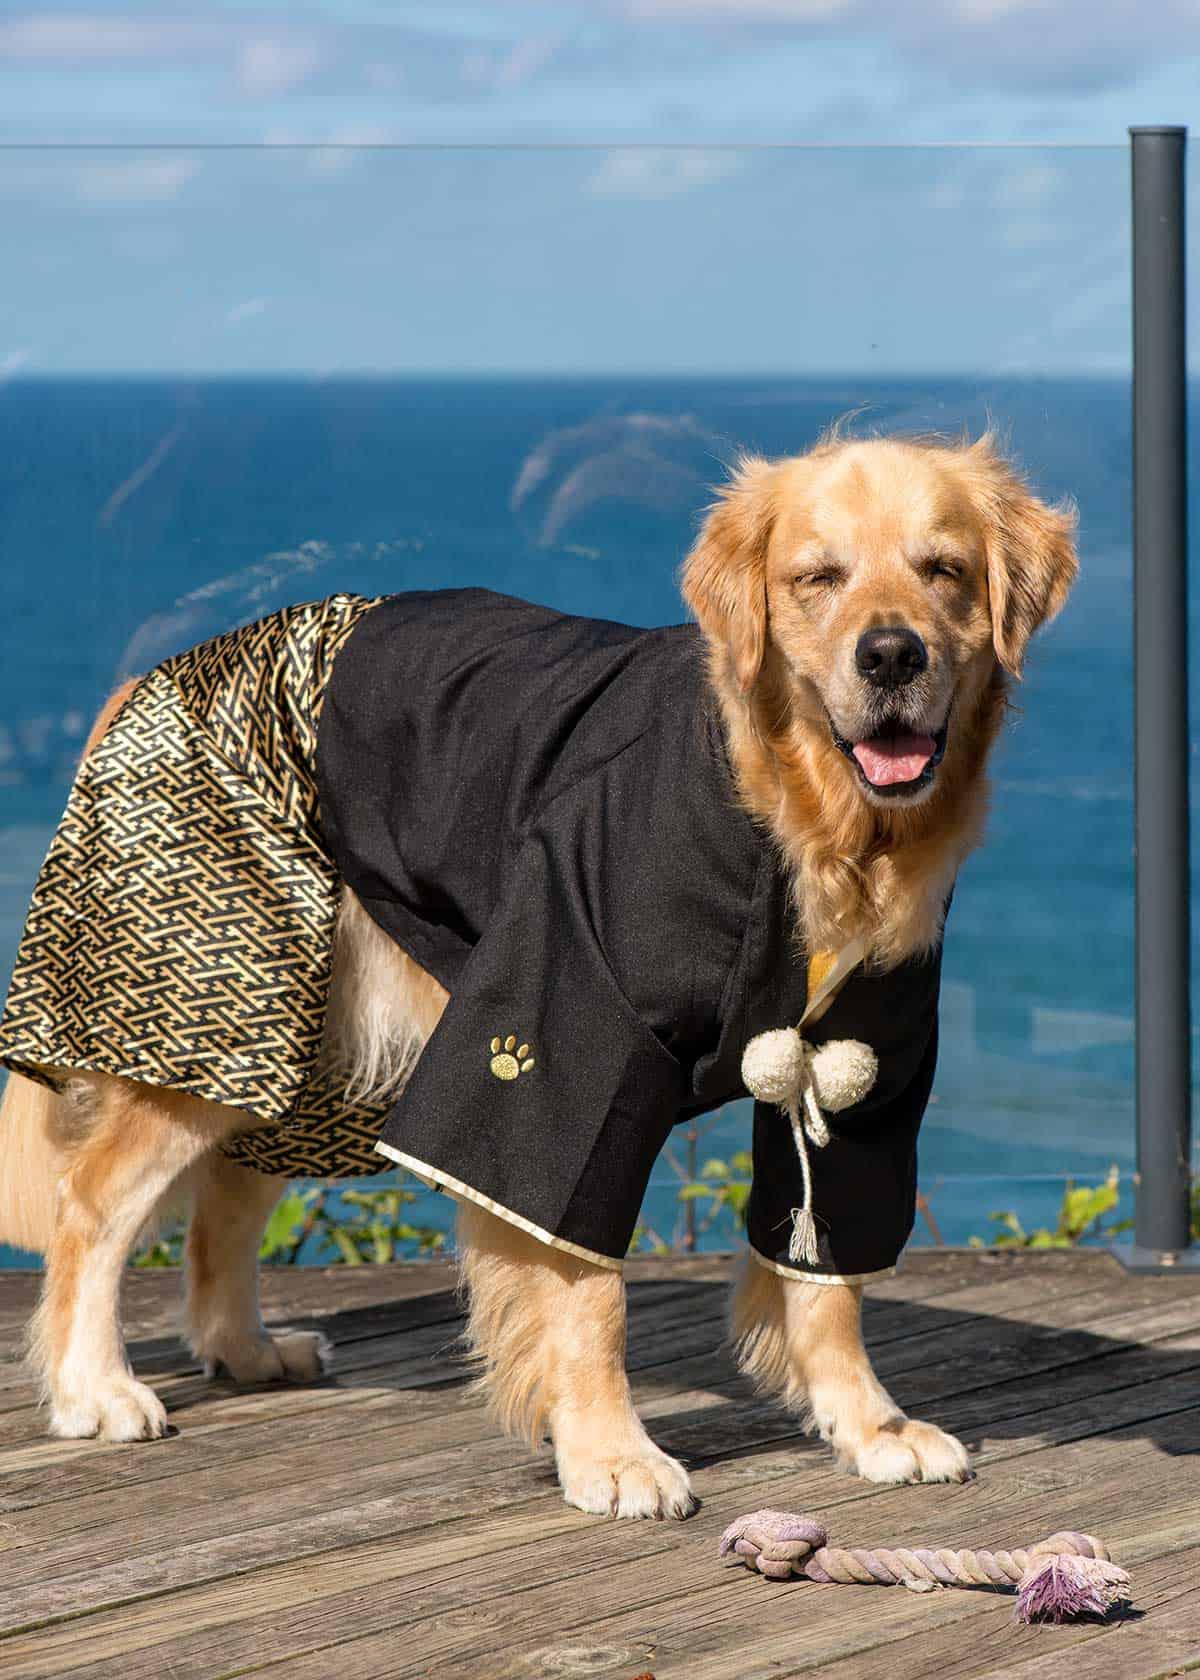 Dozer kimono from Japan Tokyo Harajuku - cute dog outfit